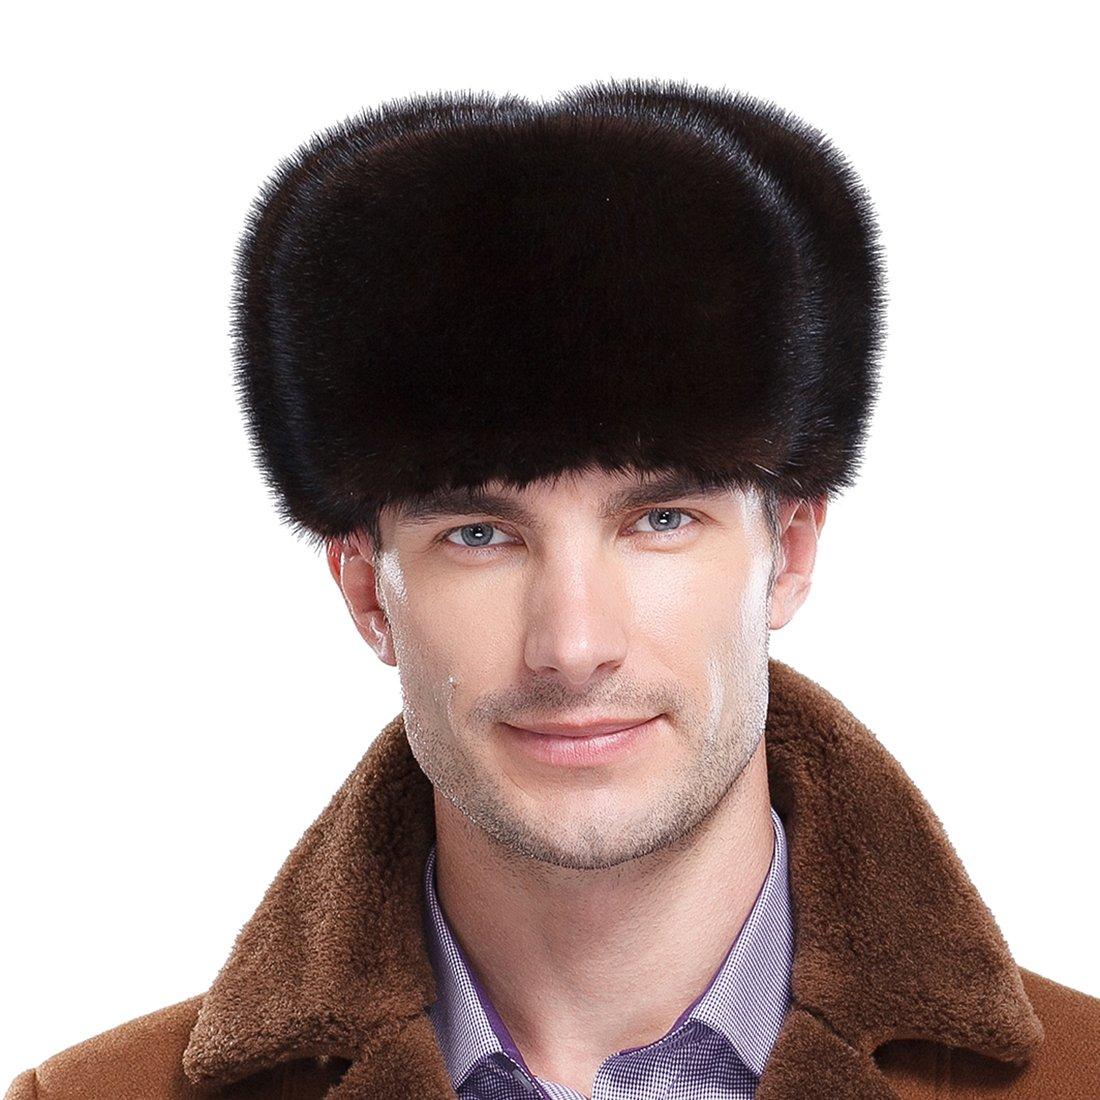 URSFUR Premium Mink Fur Russian Ushanka Trapper Hats (One Size Fits All, Natural Color)